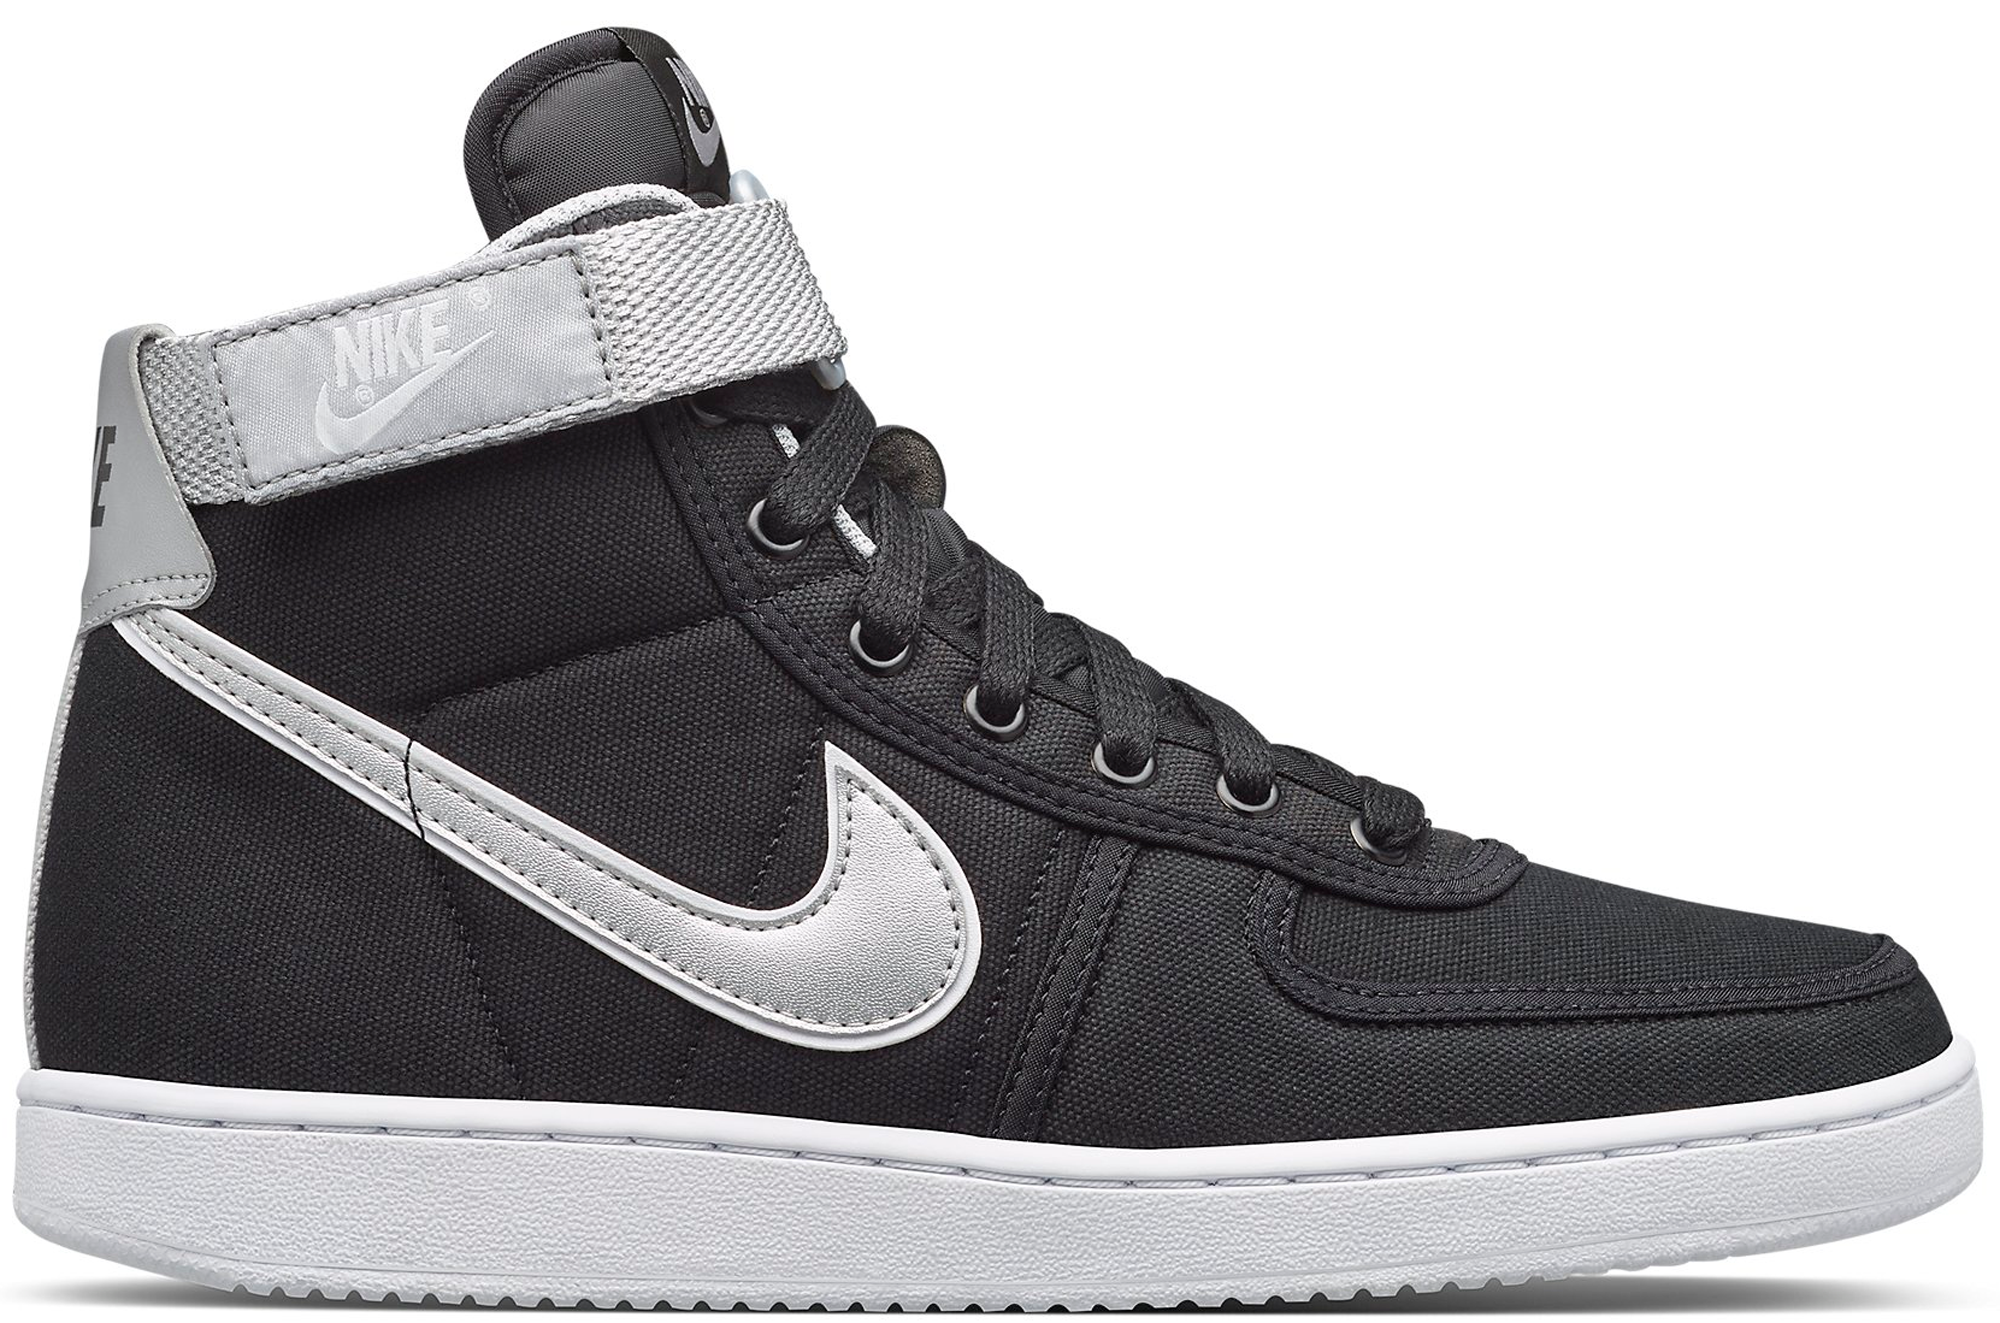 Nike Vandal High Terminator